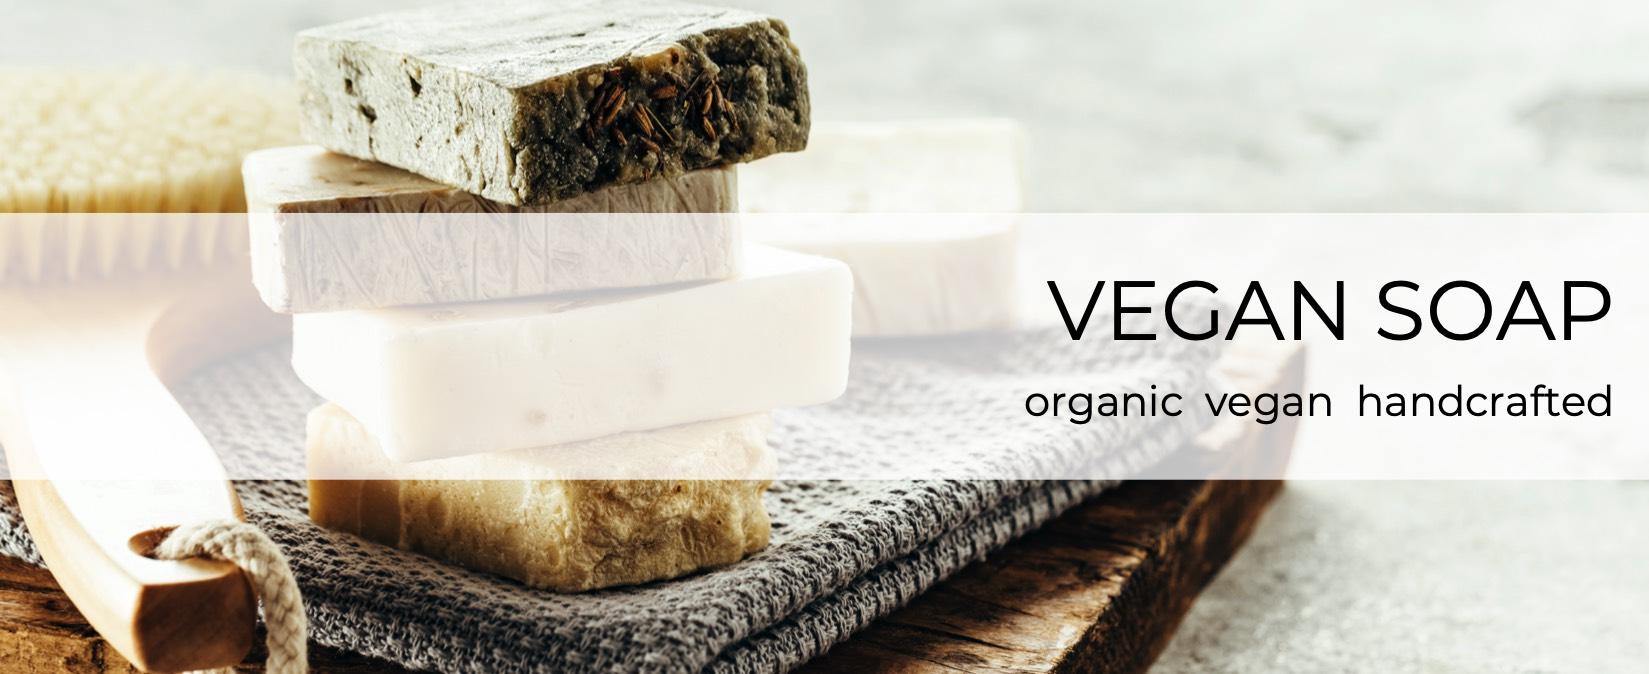 organic soap salvation wellness jersey city nj